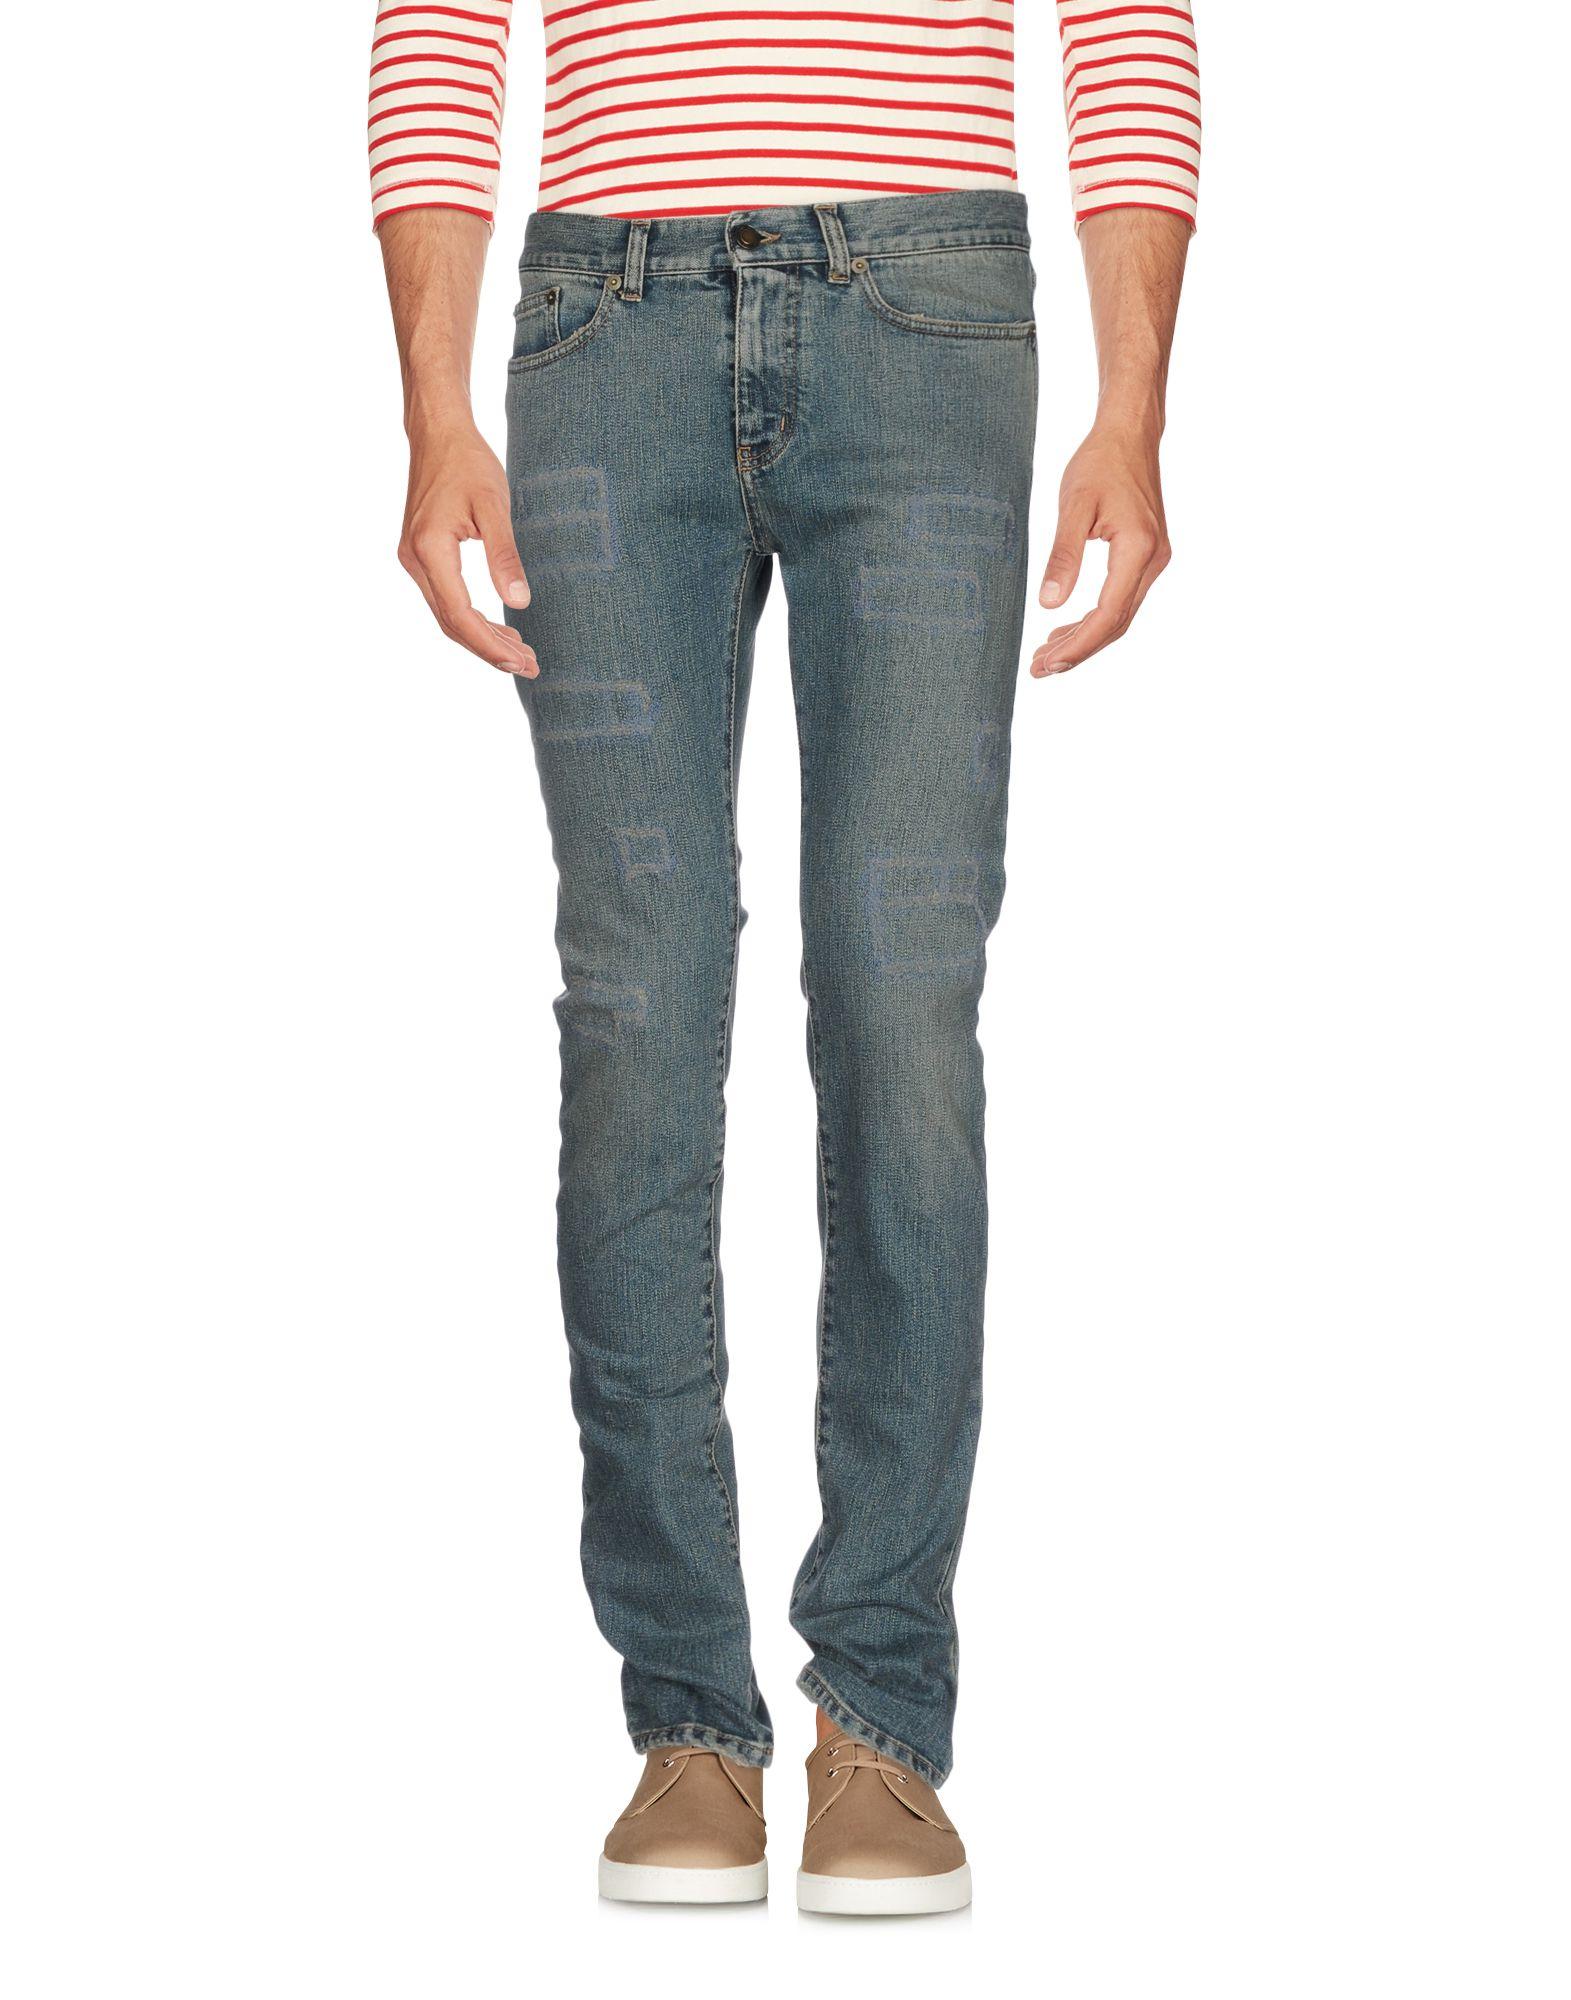 Pantaloni Jeans Saint Laurent Uomo - Acquista online su